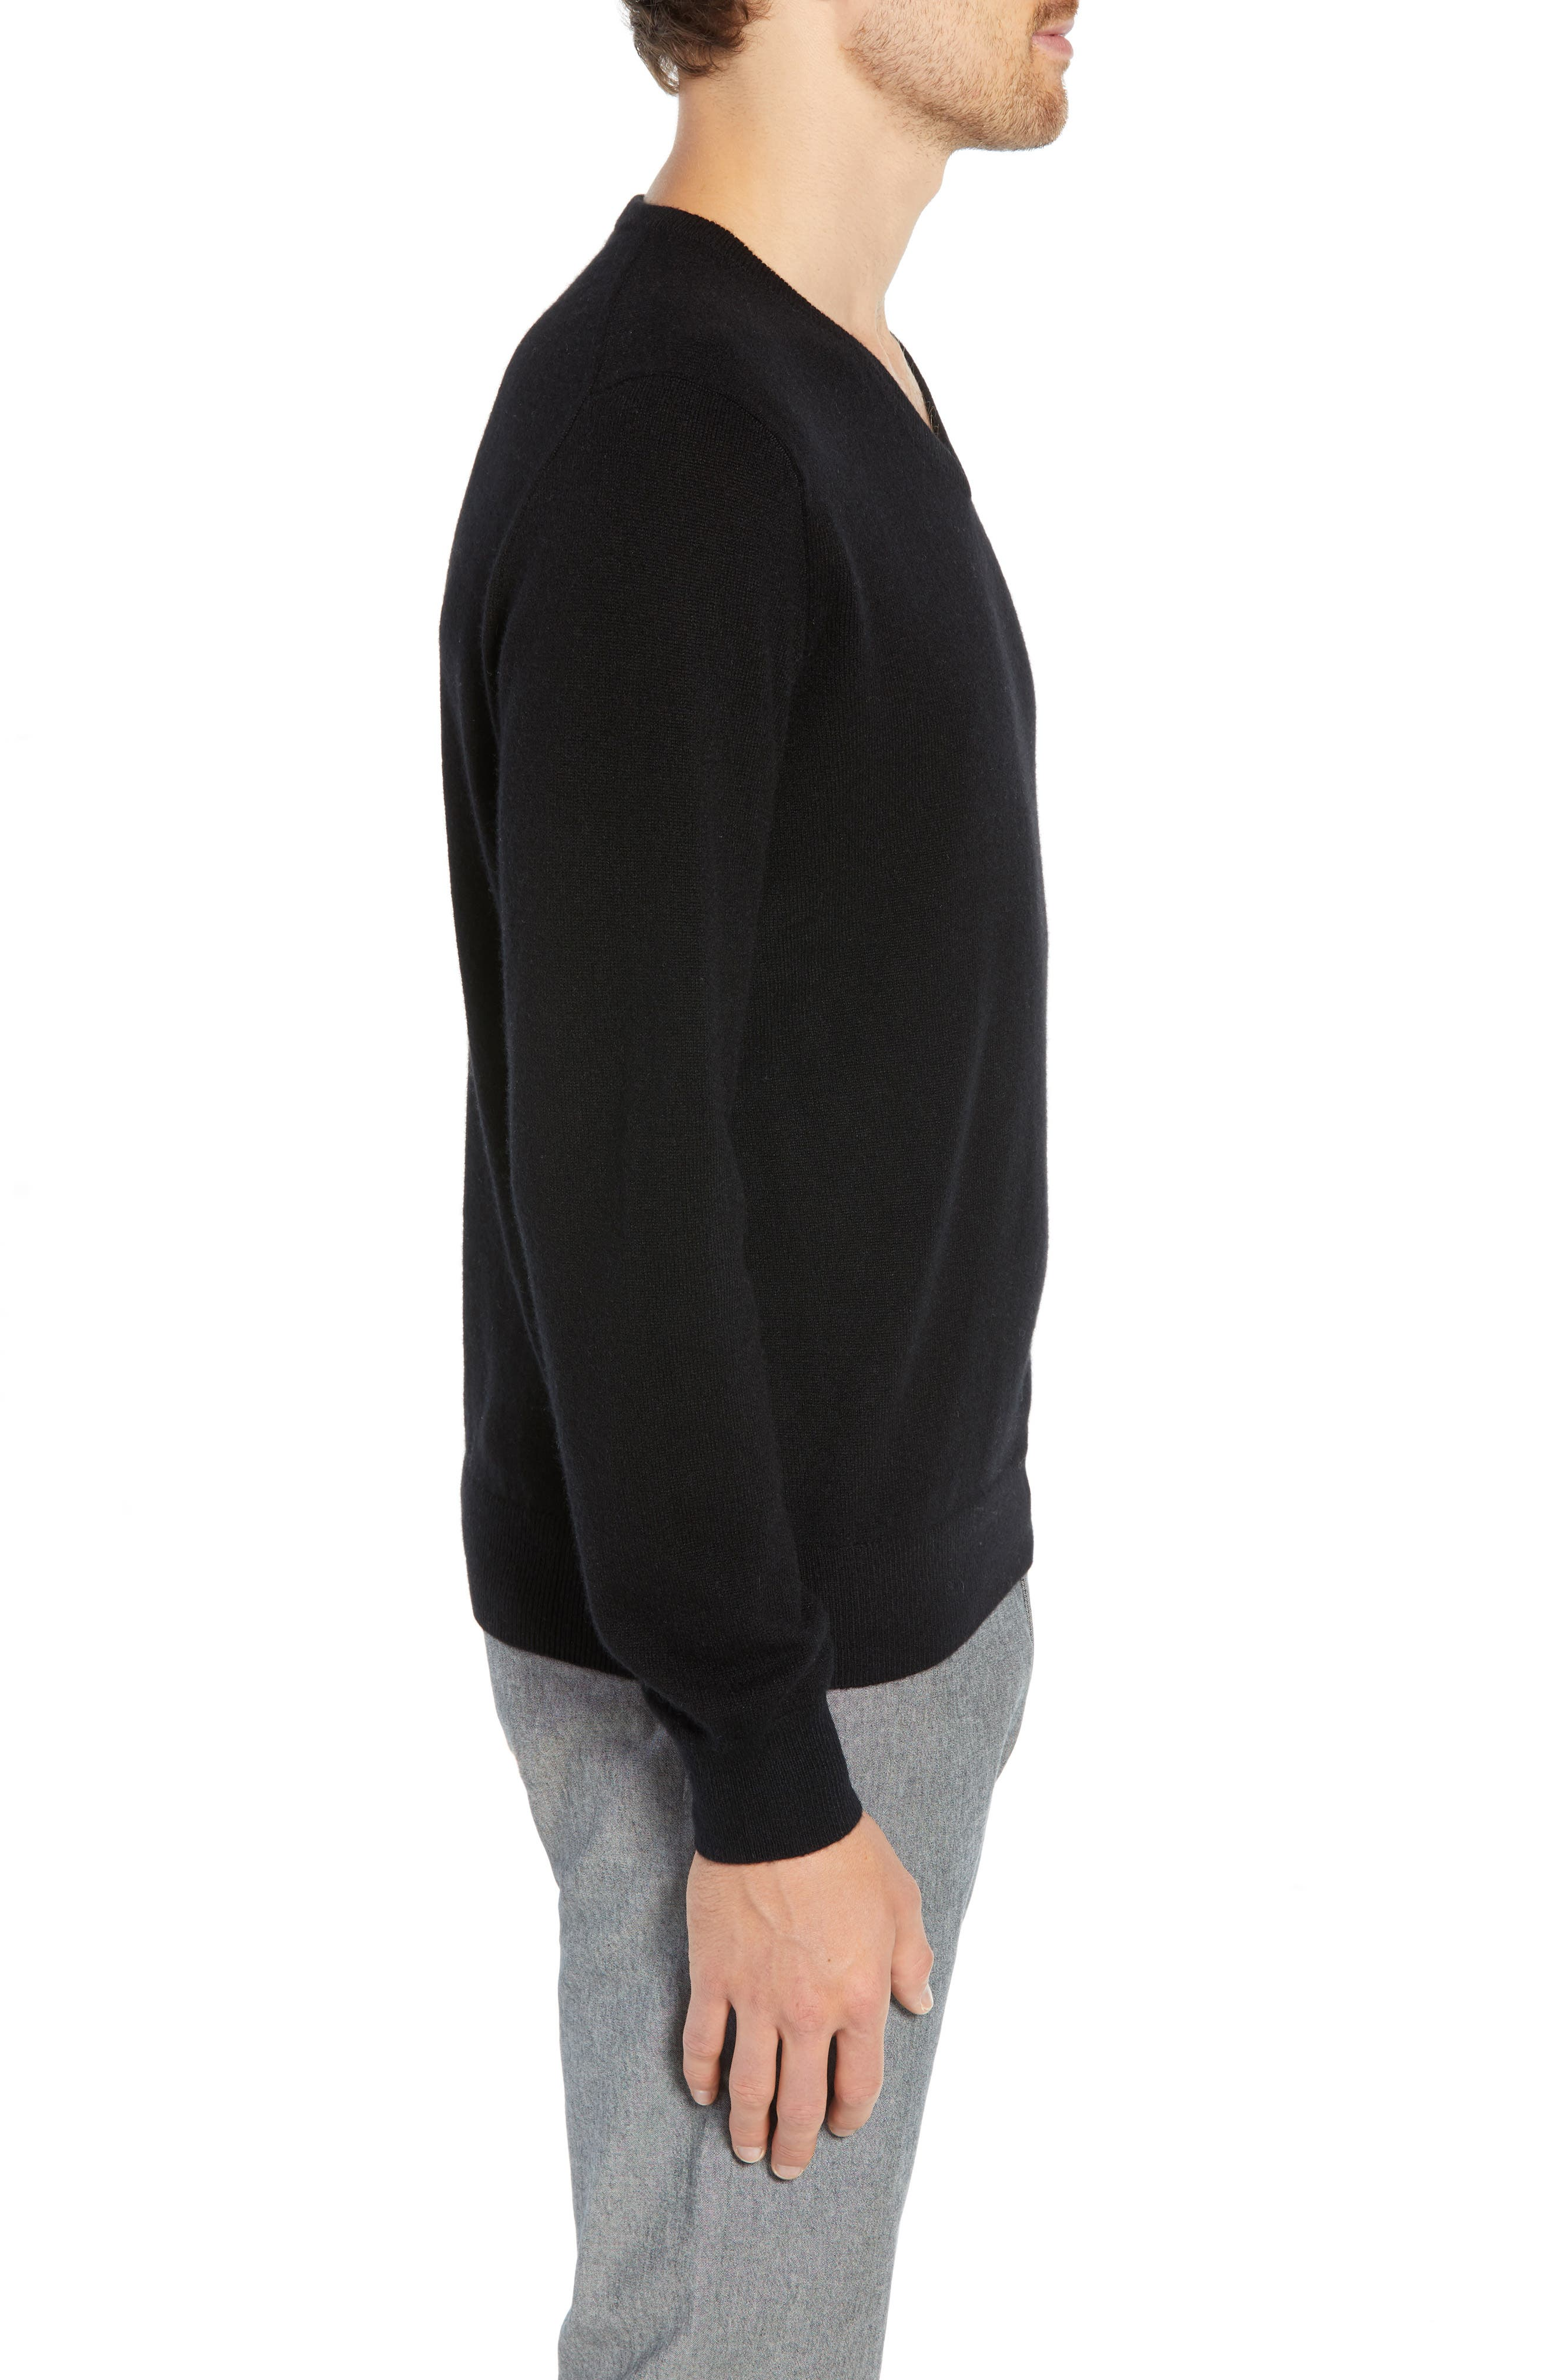 J.CREW,                             Everyday Cashmere Regular Fit V-Neck Sweater,                             Alternate thumbnail 3, color,                             001